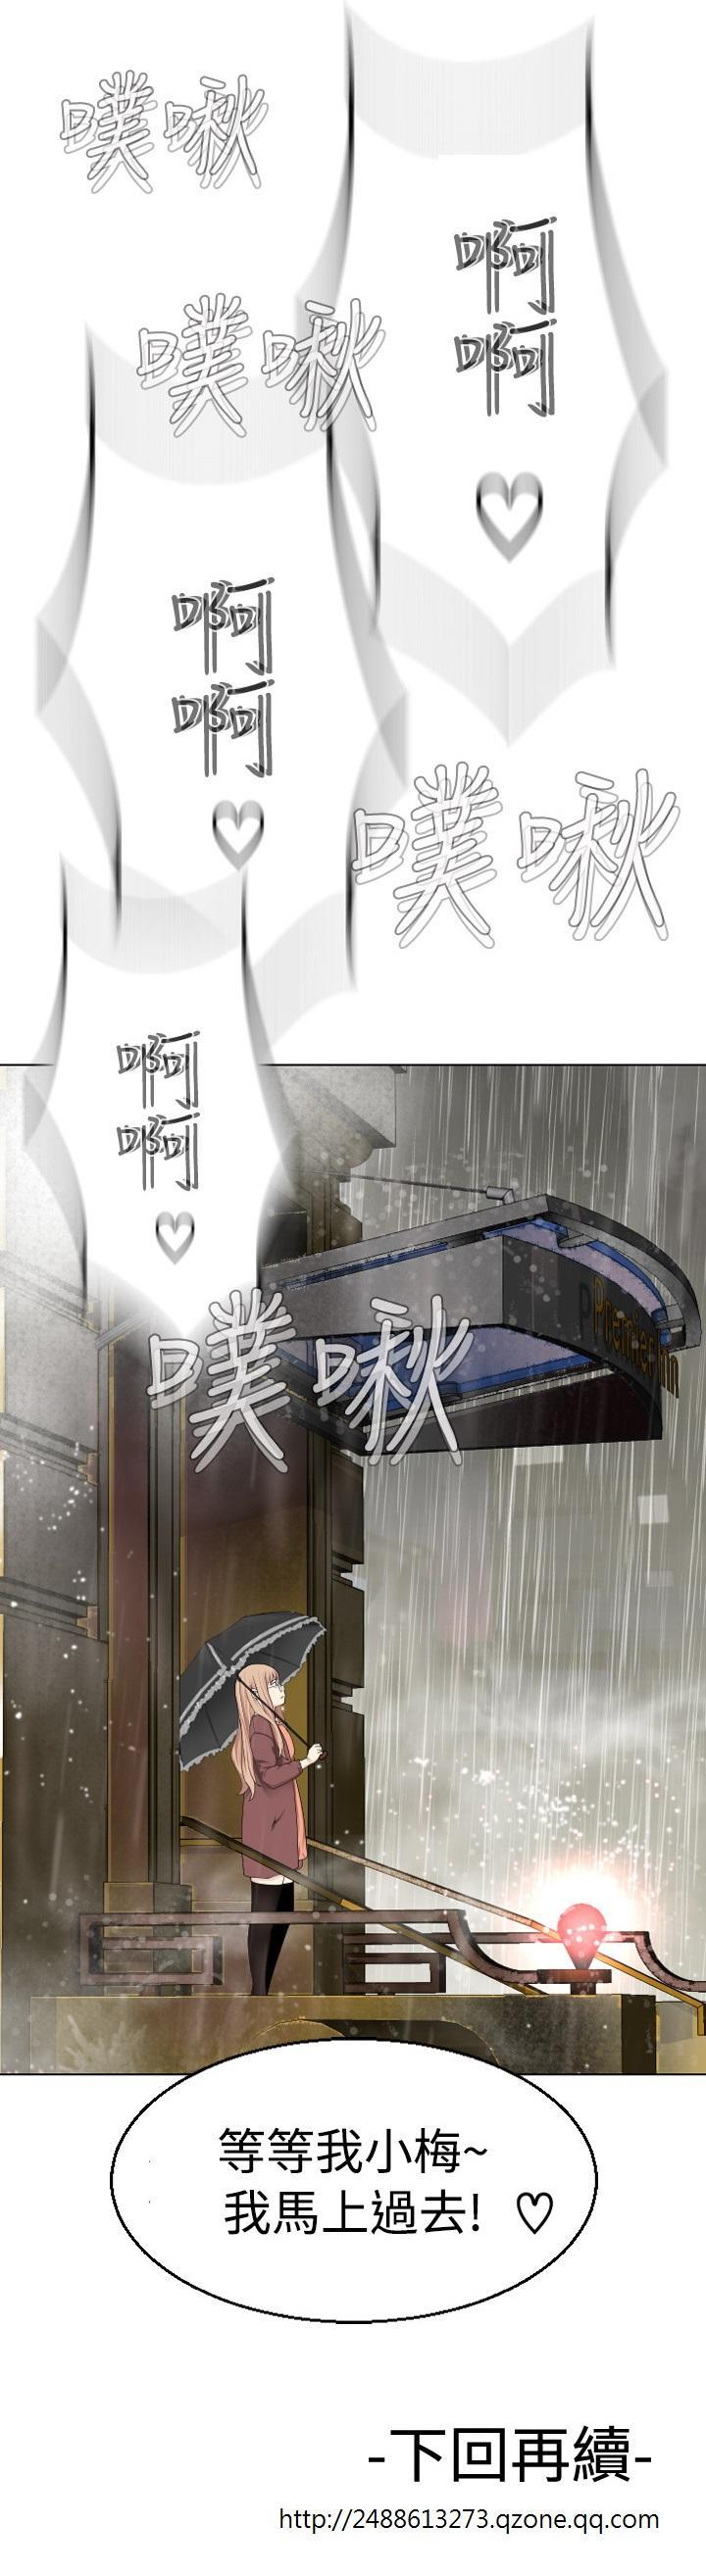 [SOSO] Franken Jo 为爱而生 法兰克赵 Ch.1~19 [Chinese]中文 254